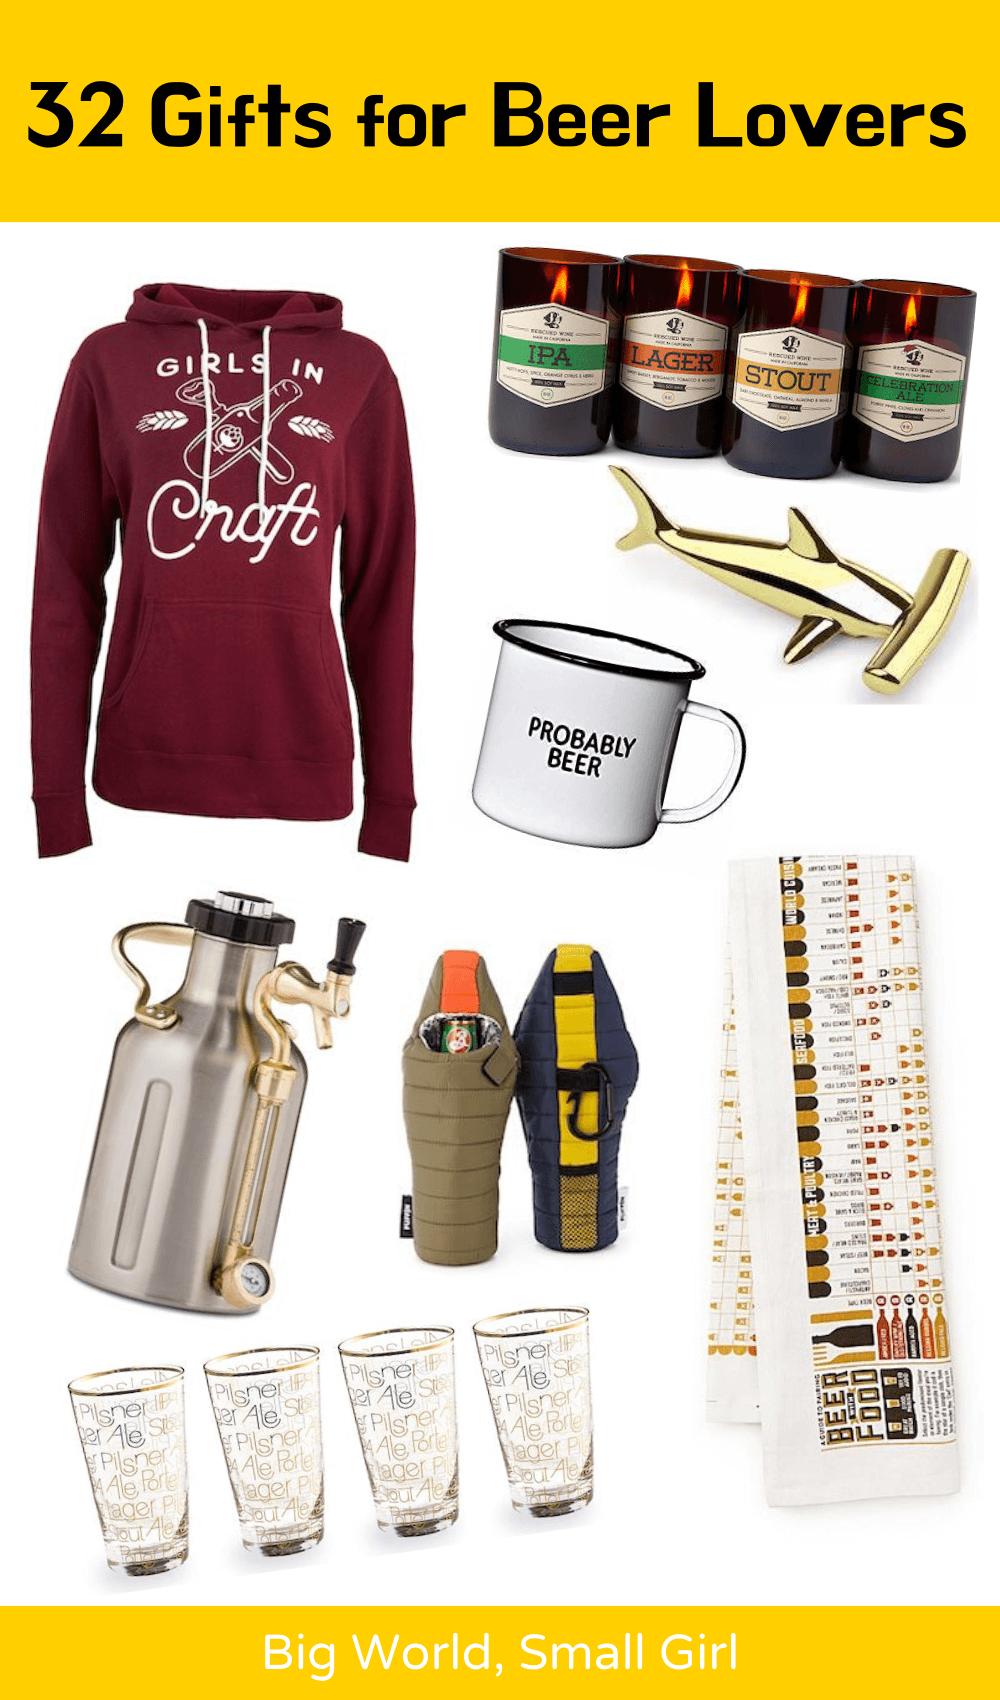 beer gift guide